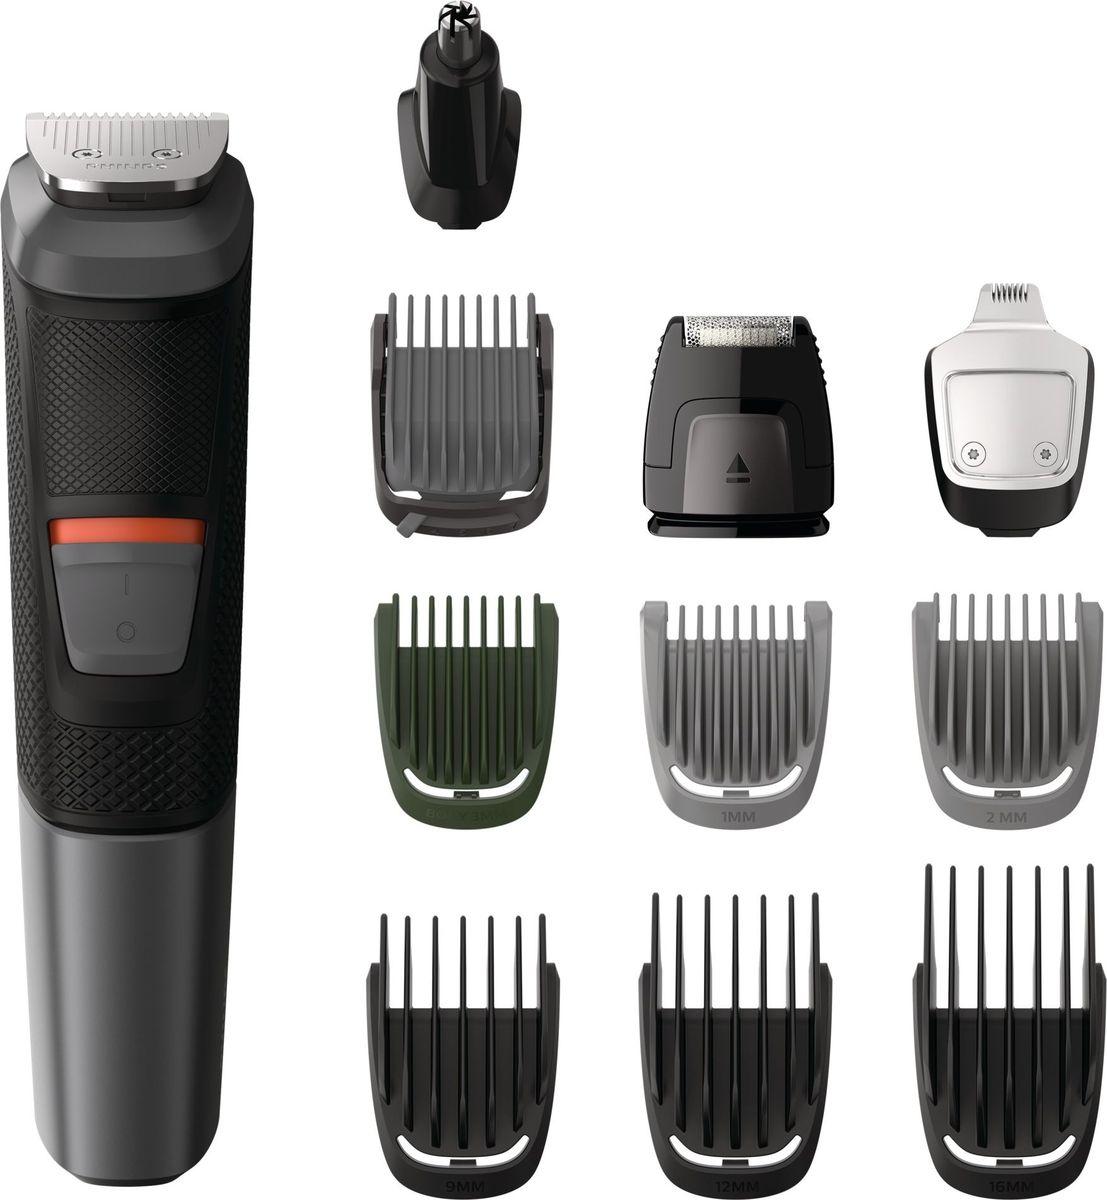 Philips MG5730 триммер 11 в 1 для волос на голове, лице и теле